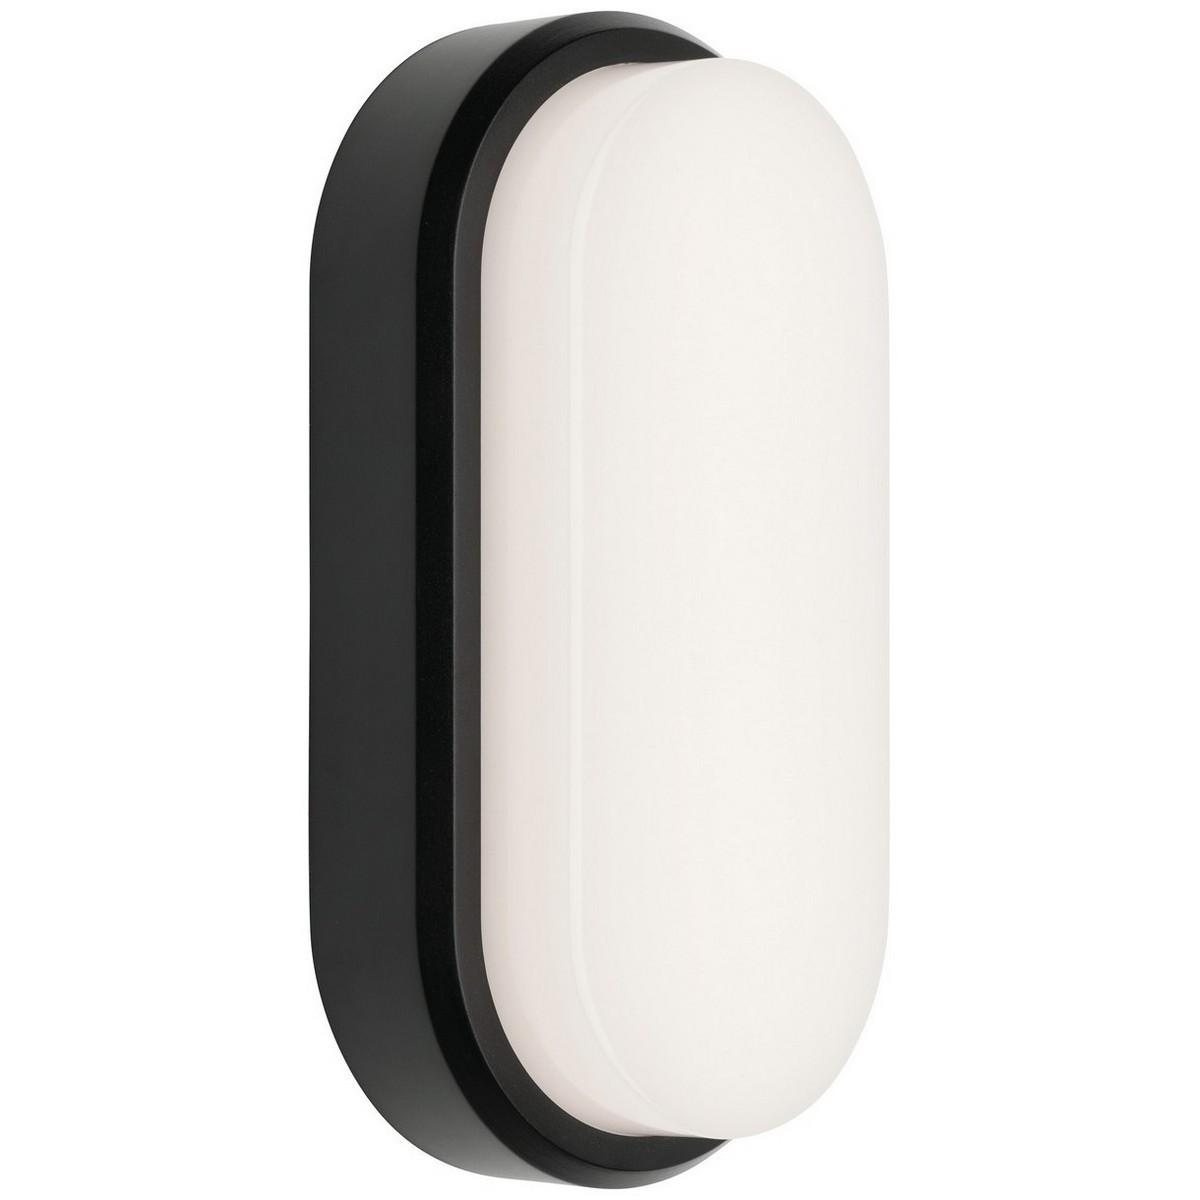 Rory IP54 LED Outdoor Oval Bunker Light, Black